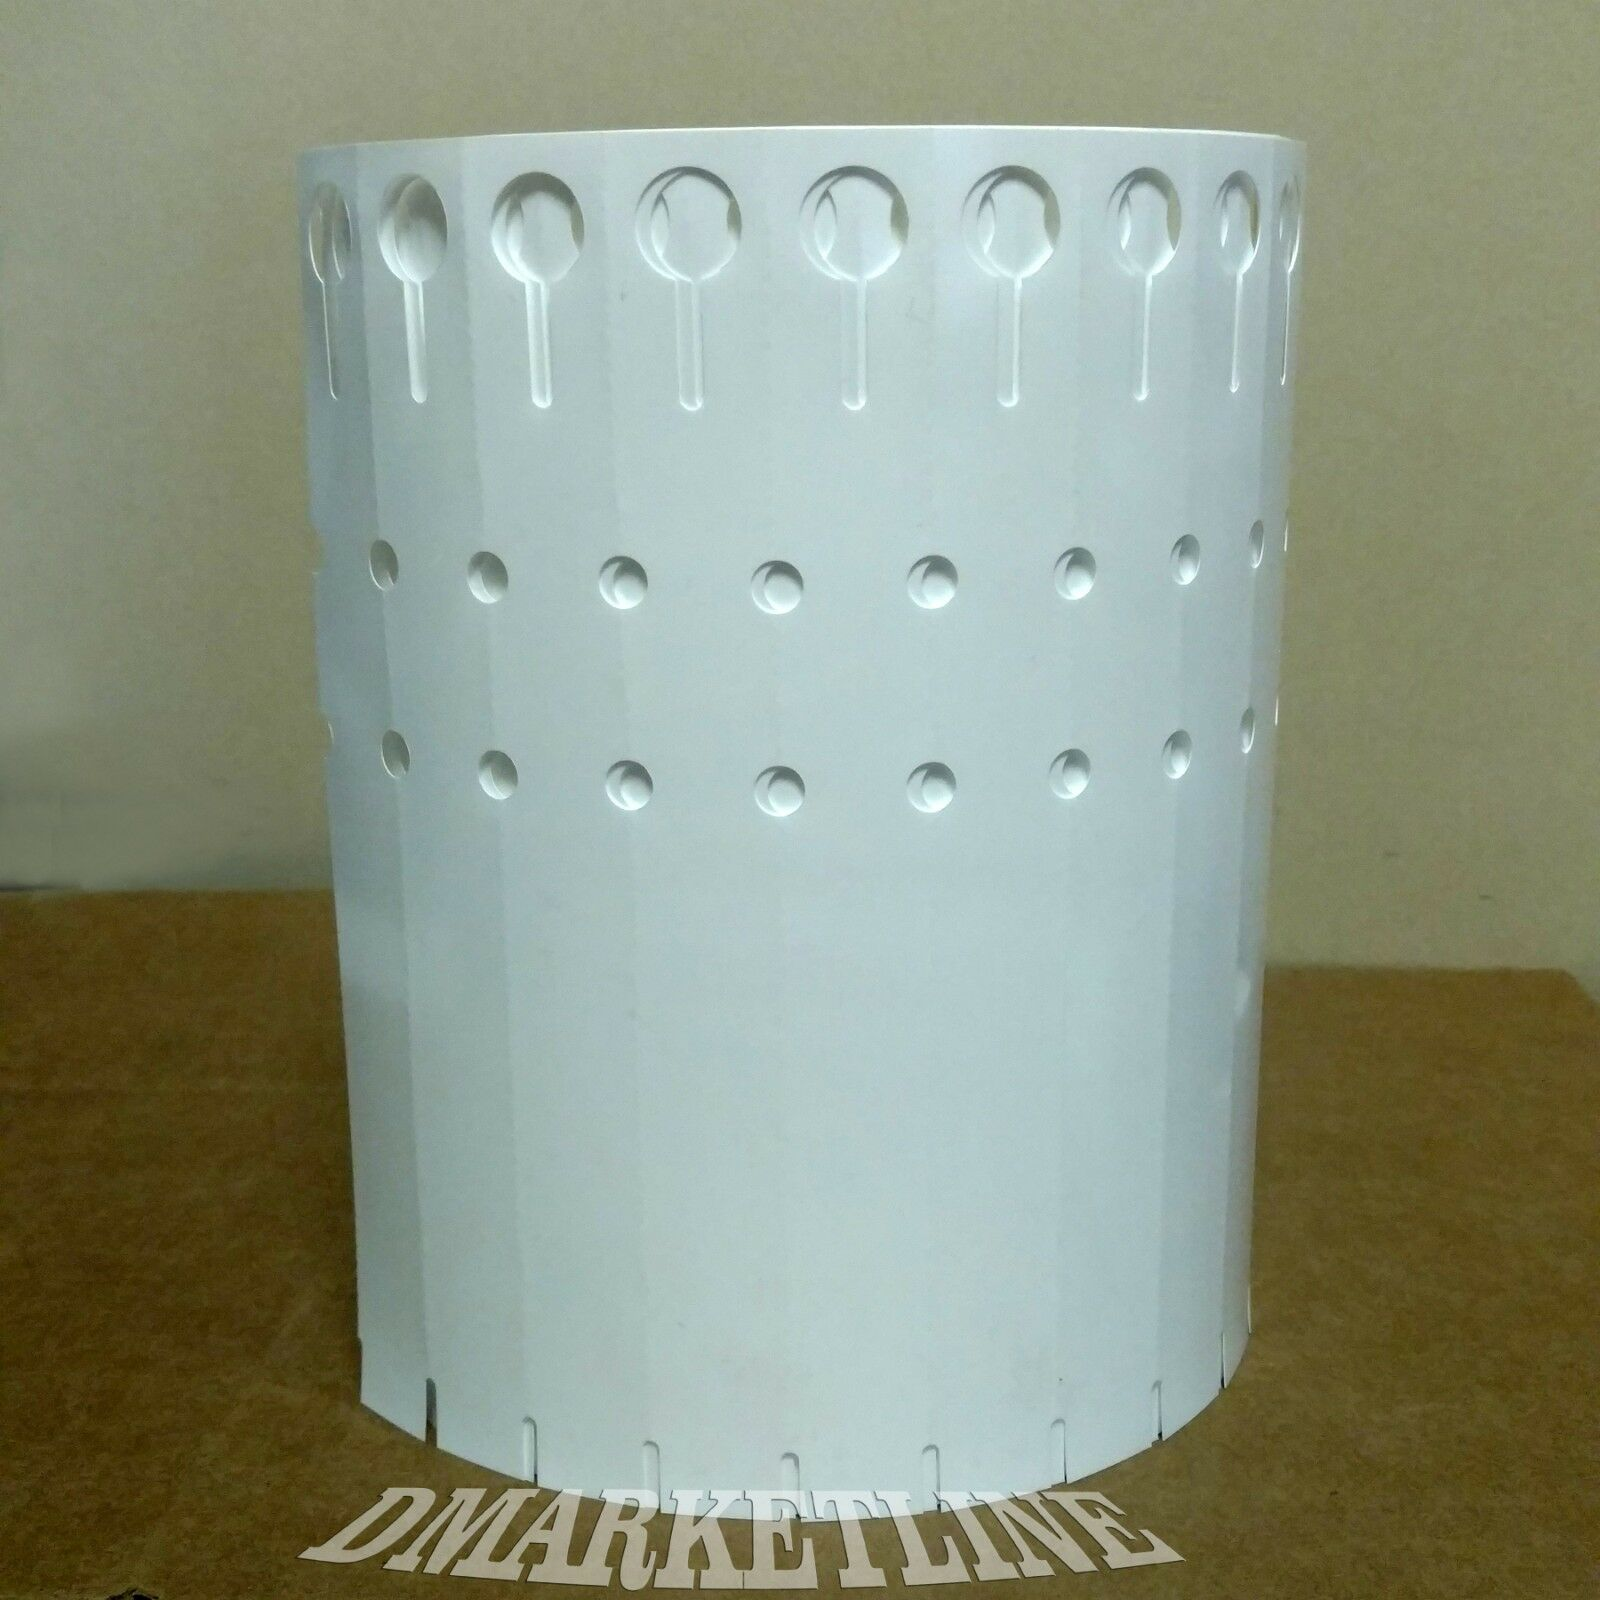 1000 etiquetas de planta térmica de plástico envolver alrojoedor de 7  X 3 4  etiquetas de bucle de árbol de Vivero